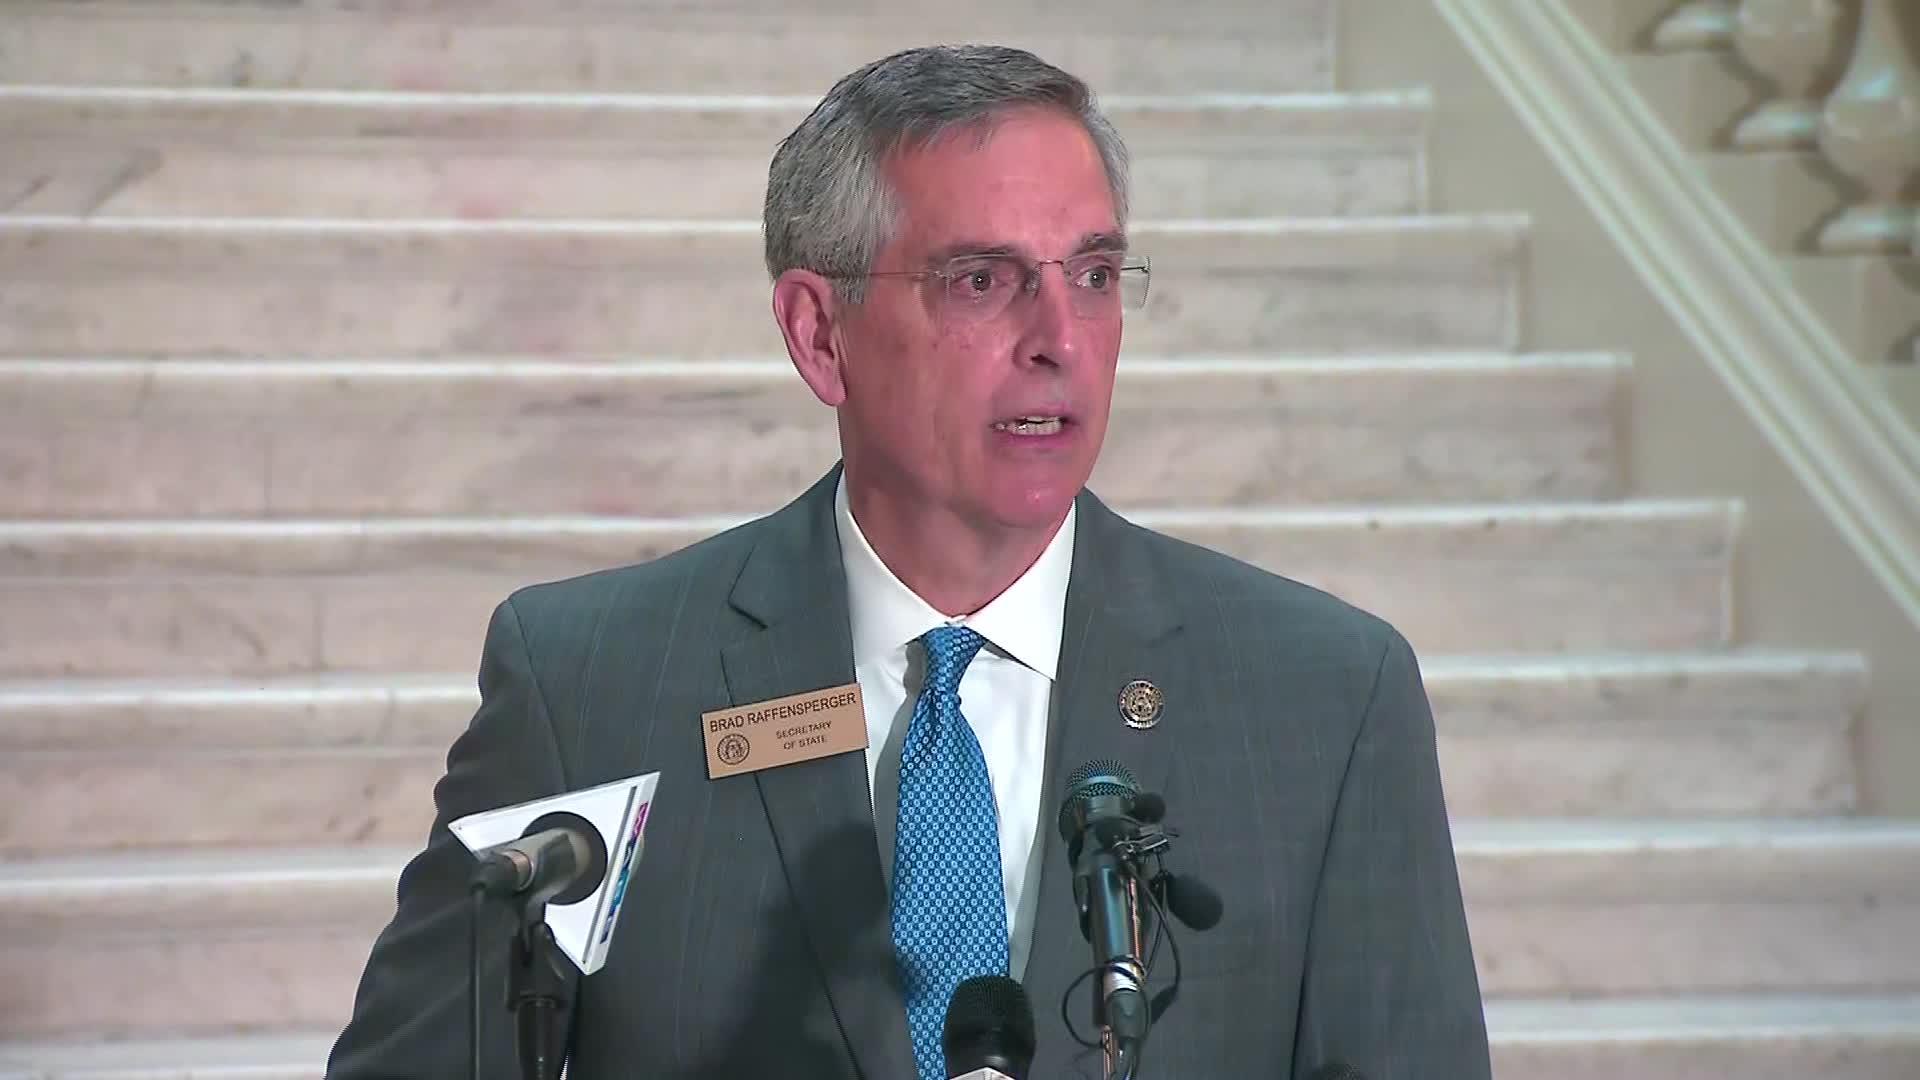 Georgia Secretary of State BradRaffensperger holds a press conference in Atlanta on October 14.